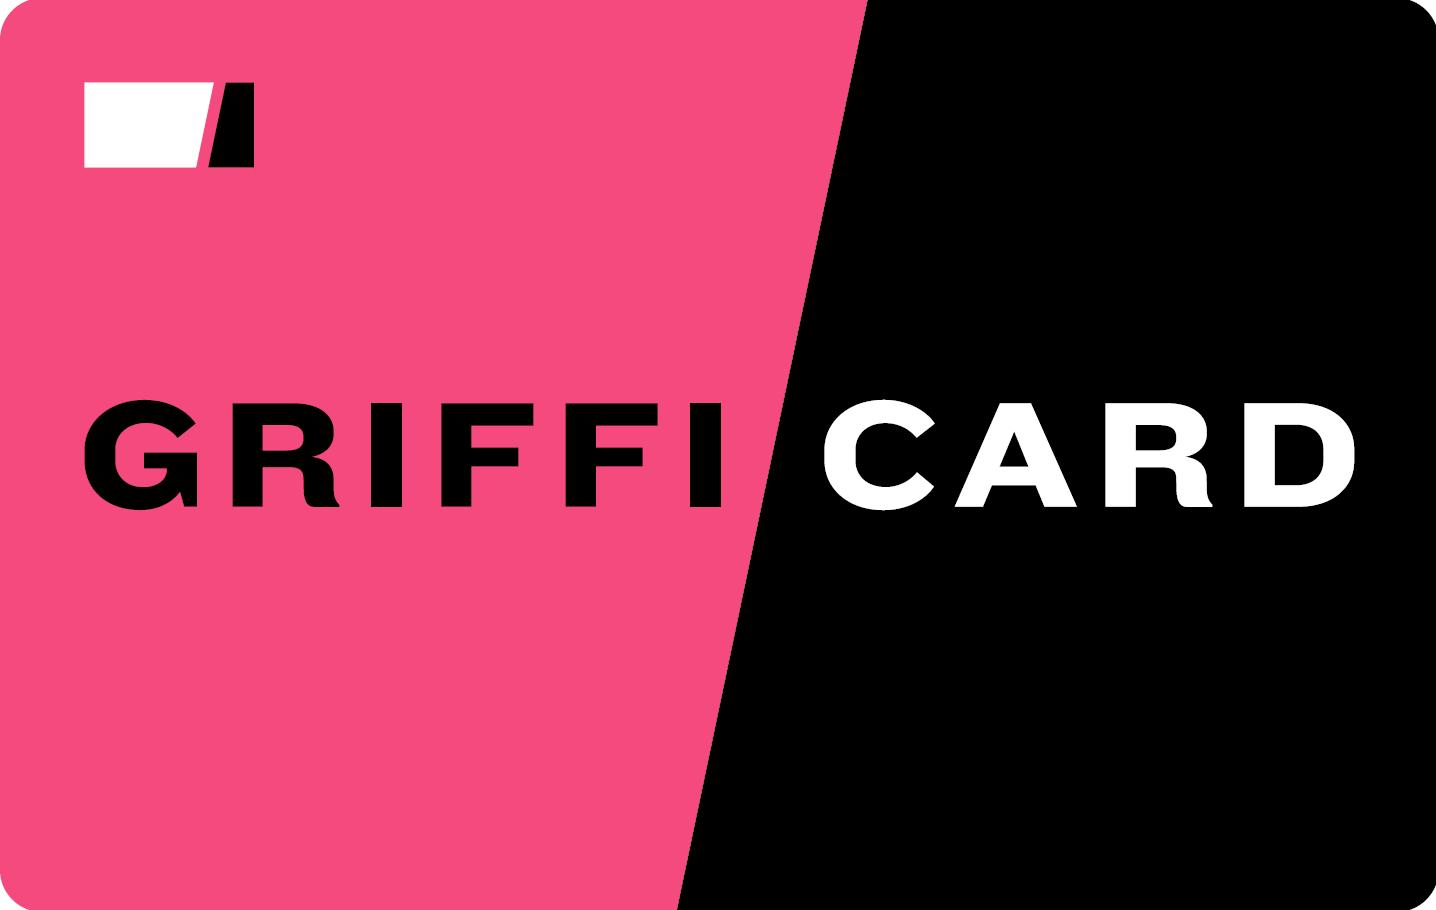 GRIFFI CARD JPG.png